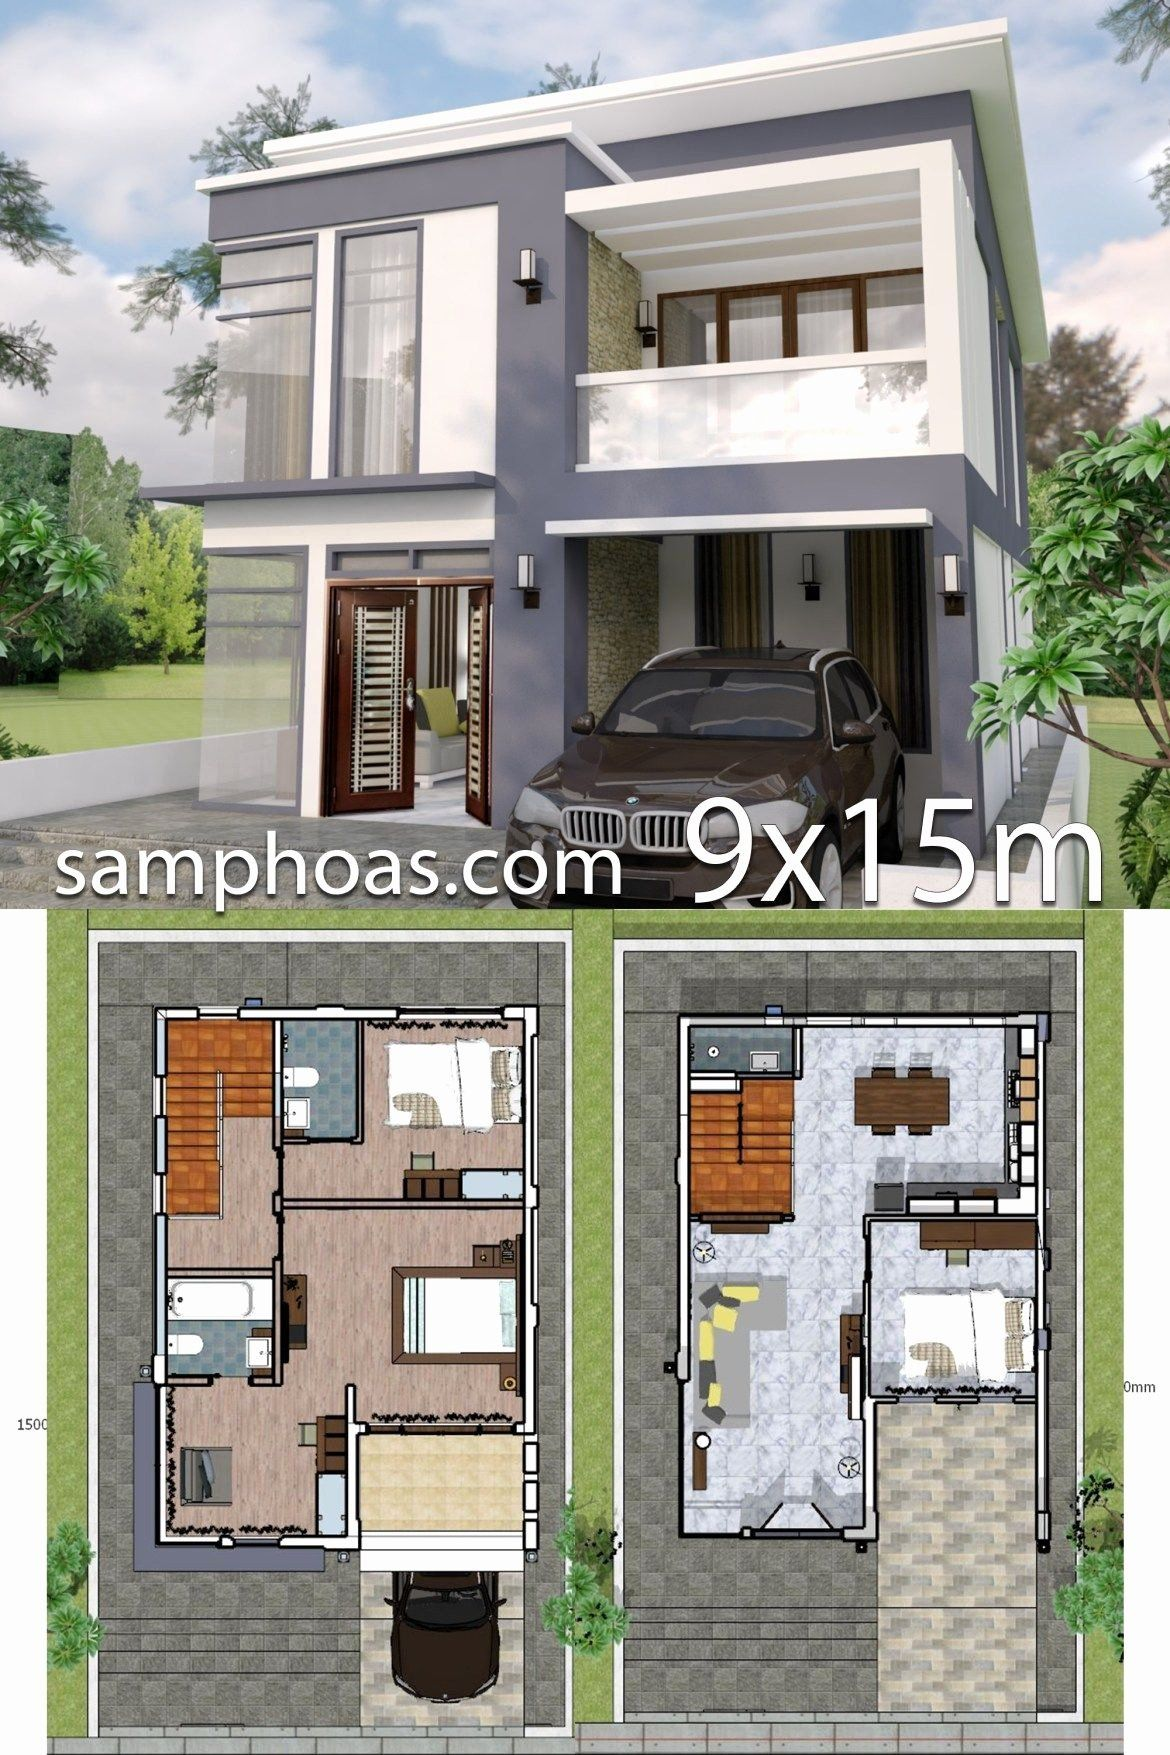 Home Design Interior 3d Lovely Plan 3d Interior Design Home Plan 7x10m Full Plan 3beds 3d House Plans House Designs Exterior House Plans